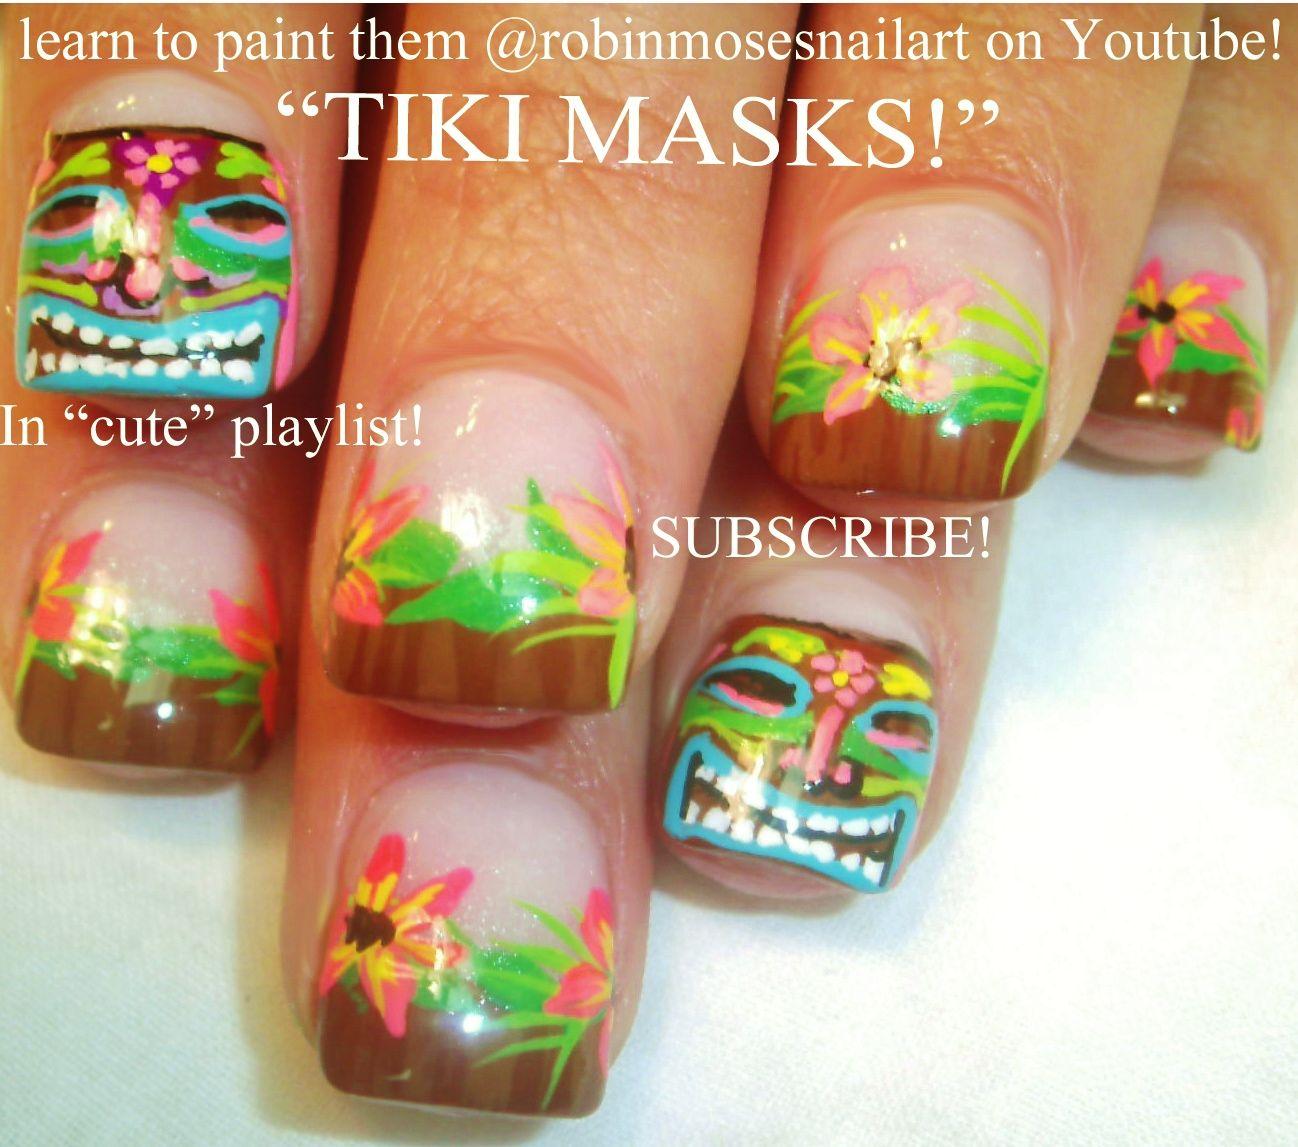 Hawaiian nail design google search nails pinterest tiki nail art w hawaii hibiscus flowers by robin moses prinsesfo Gallery